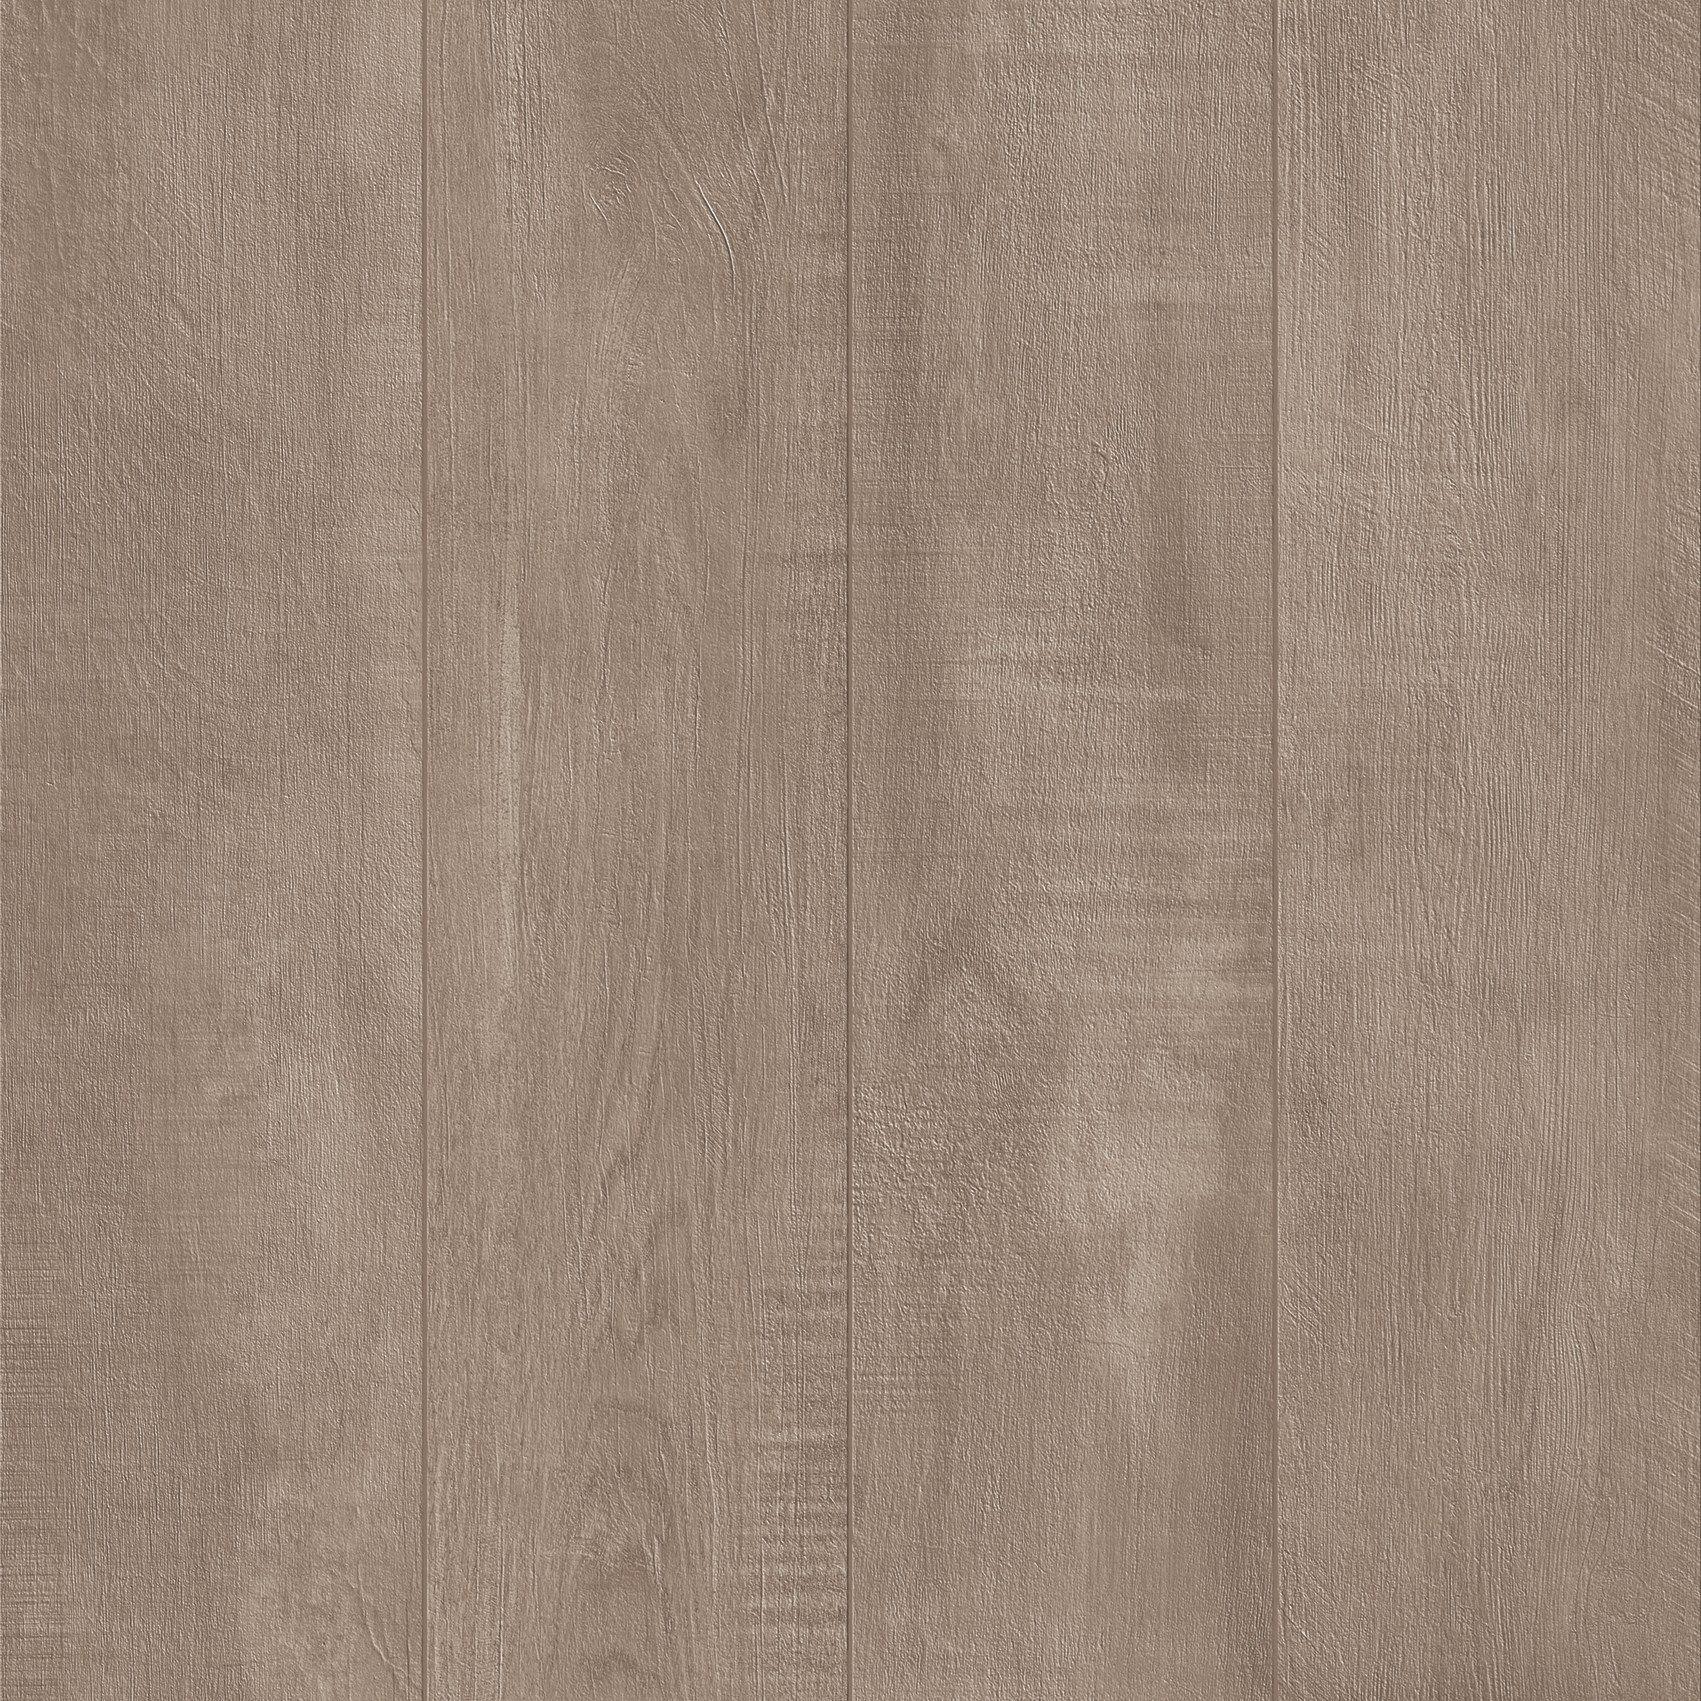 Carrelage ext rieur effet bois wildwood 20mm by gres for Carrelage effet bois